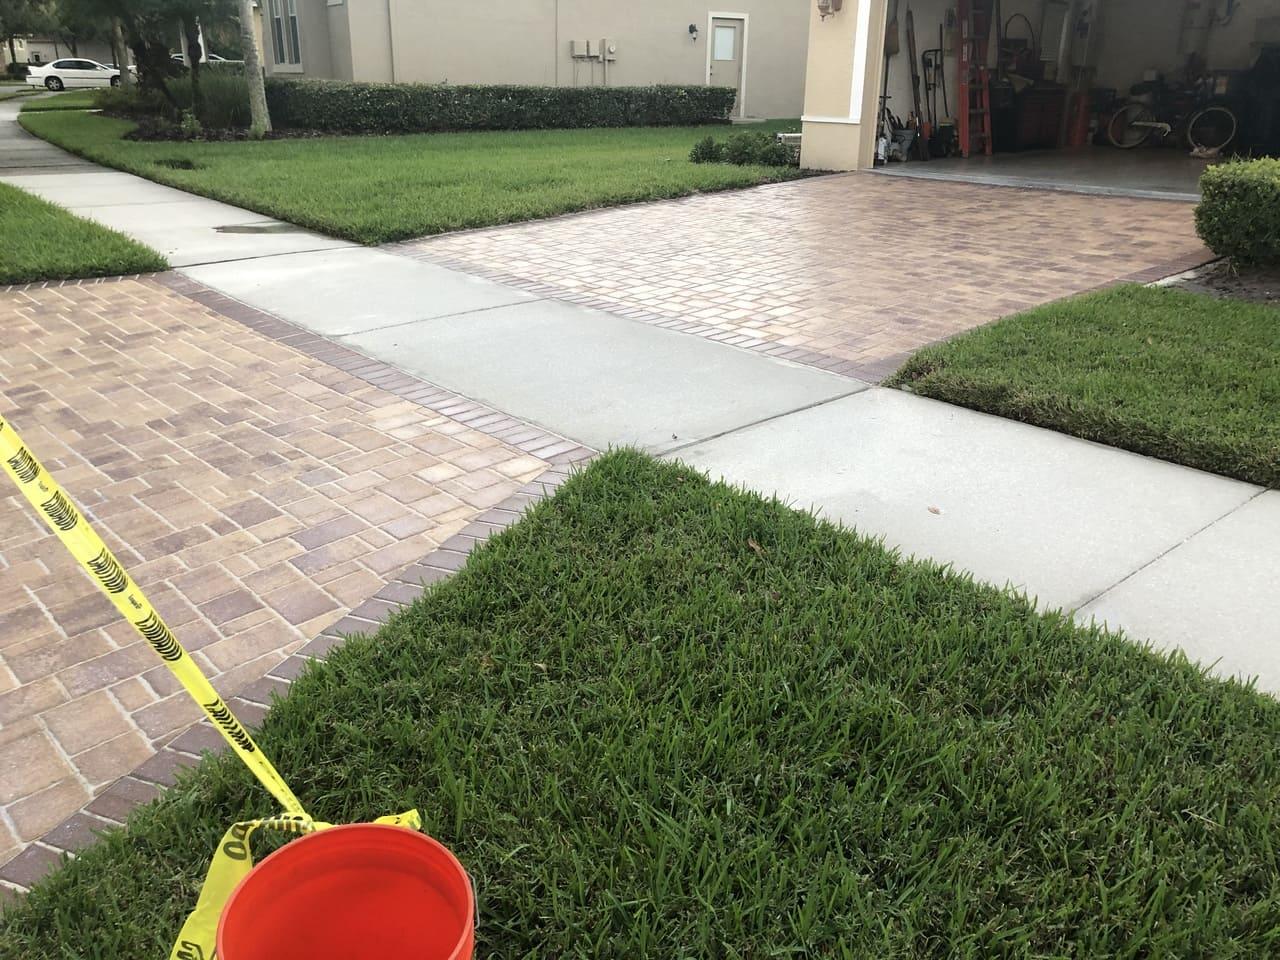 new pavement paver stripping